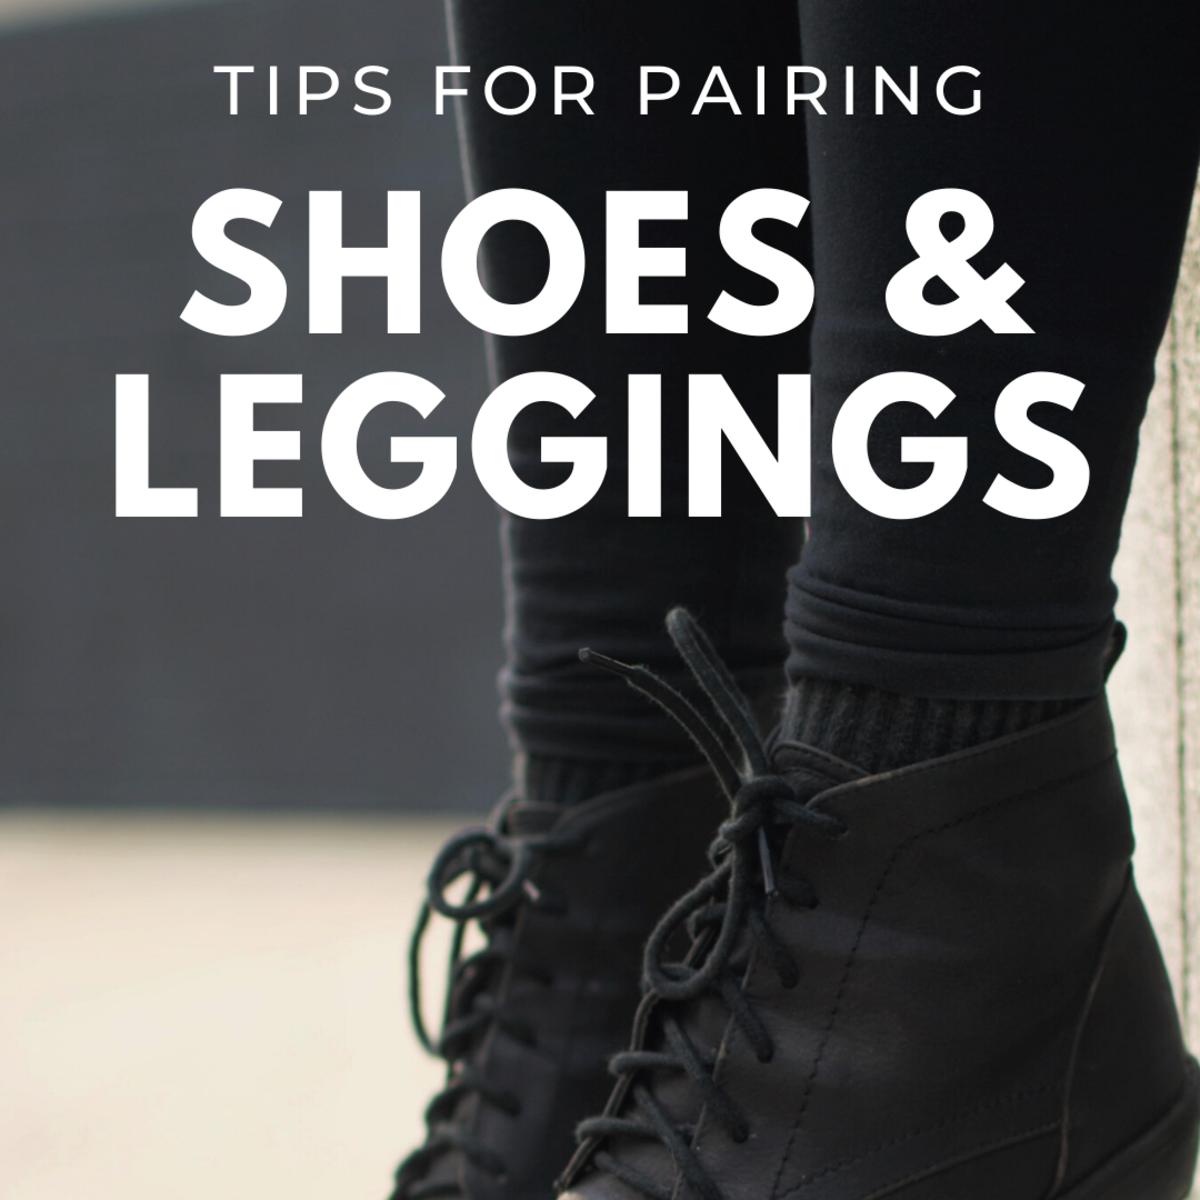 best sneakers to wear with leggings